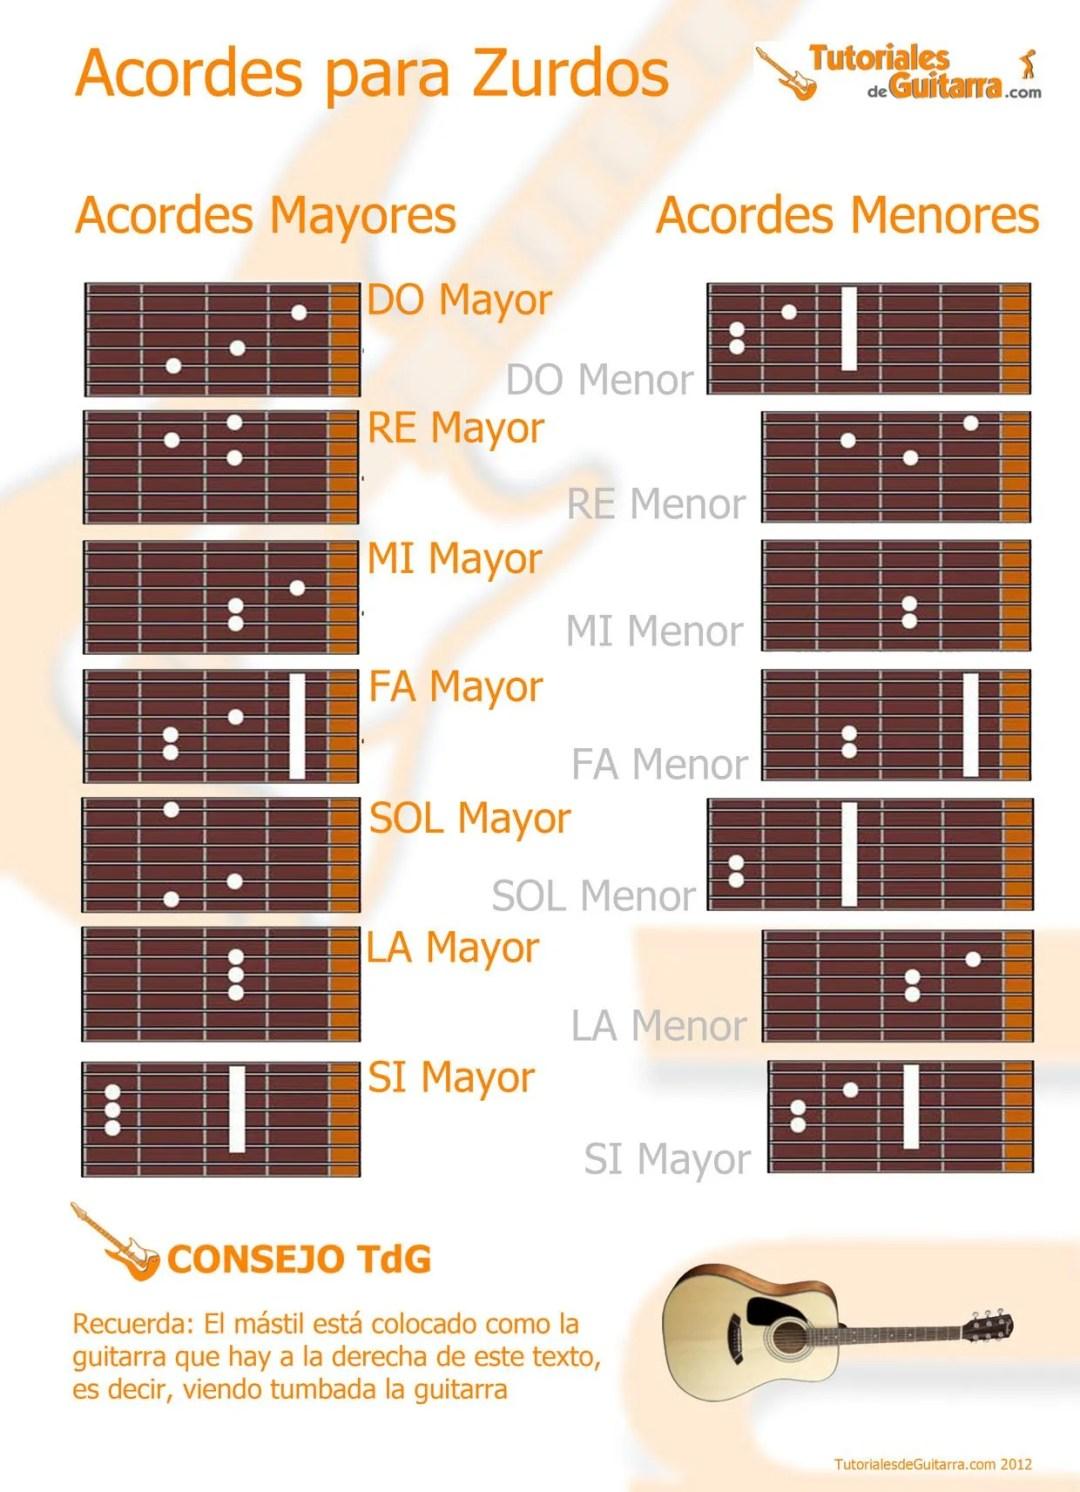 Acordes de guitarra para zurdos - tutorialesdeguitarra.com